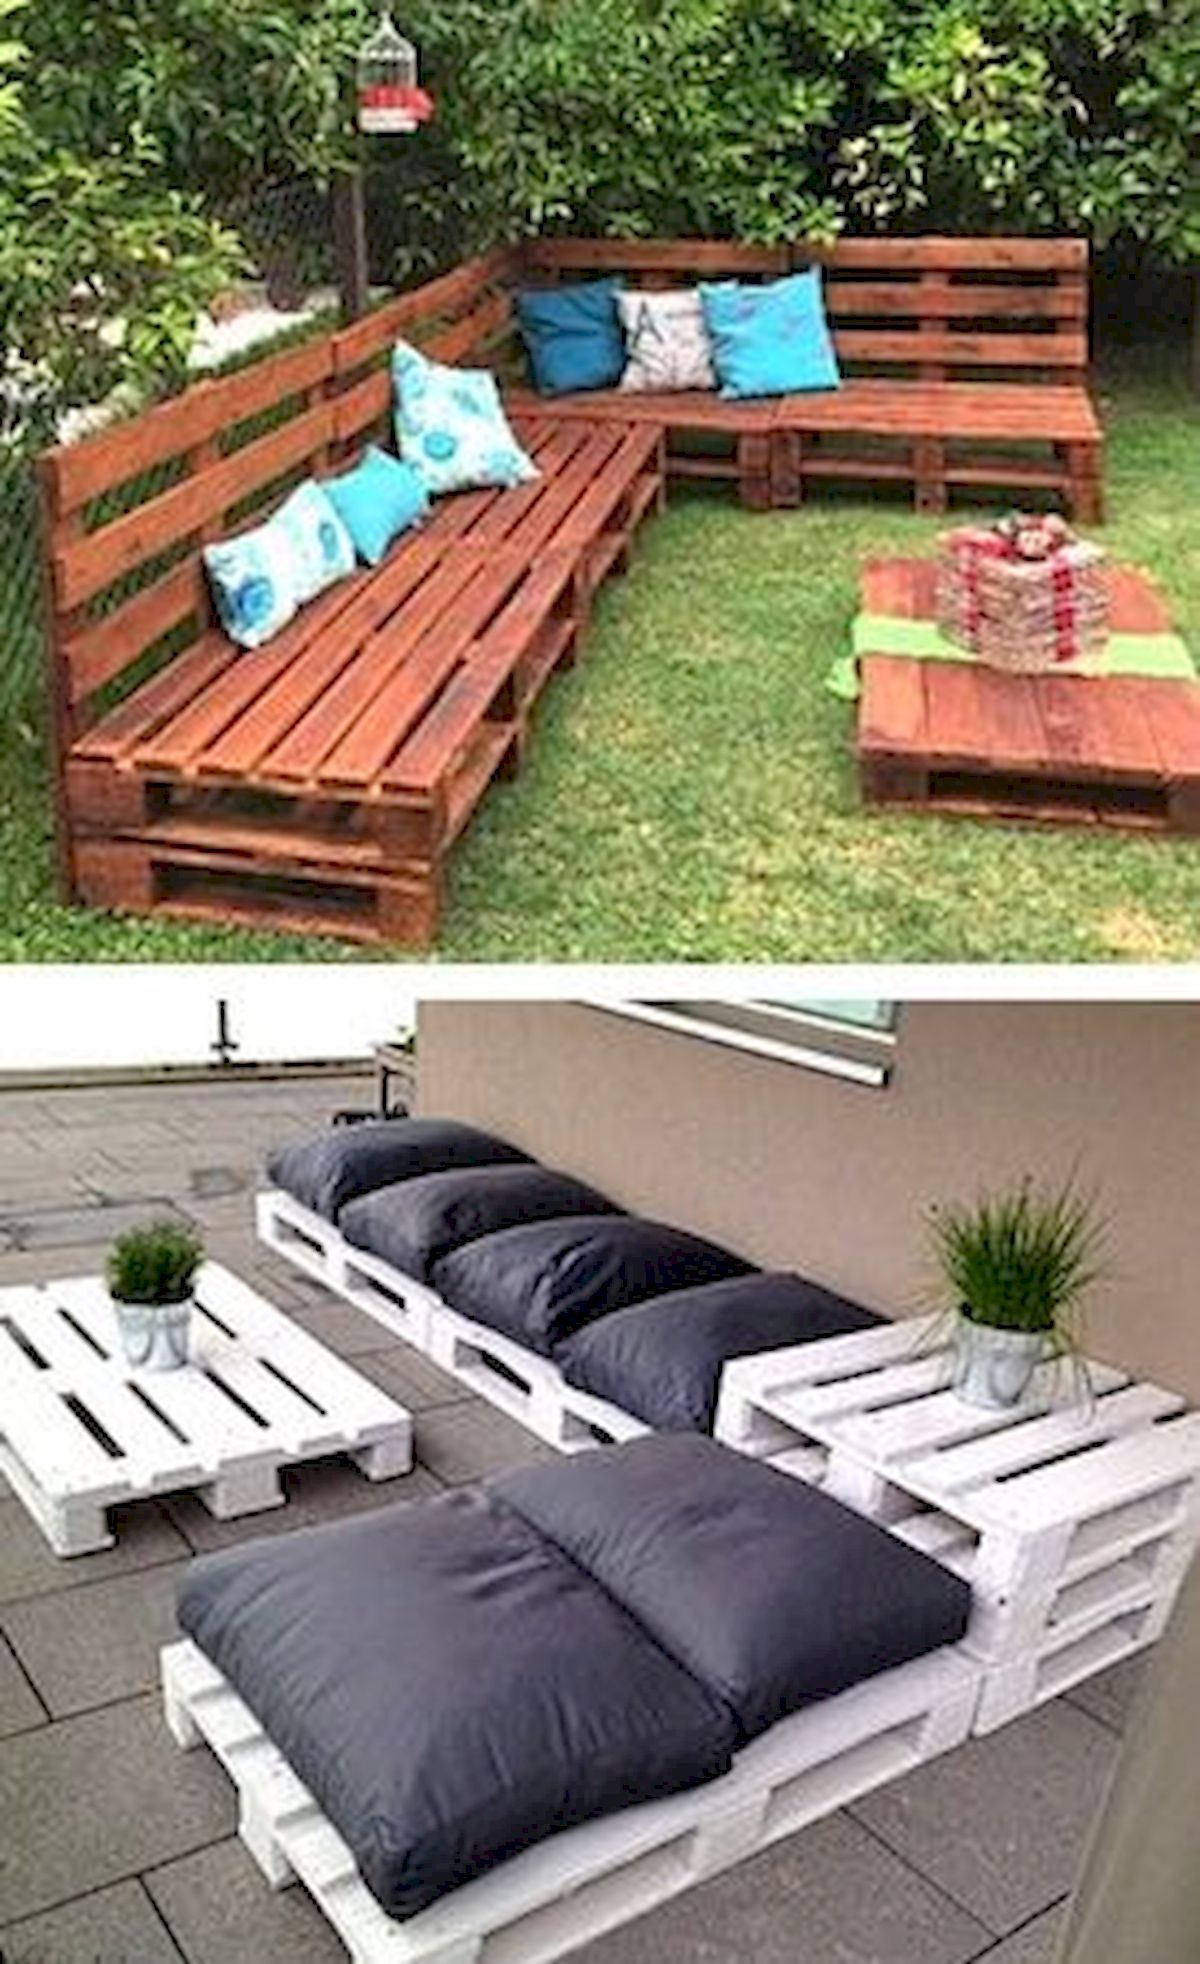 30 Awesome Diy Patio Furniture Ideas Backyard Patio Furniture Pallet Garden Furniture Diy Patio Furniture